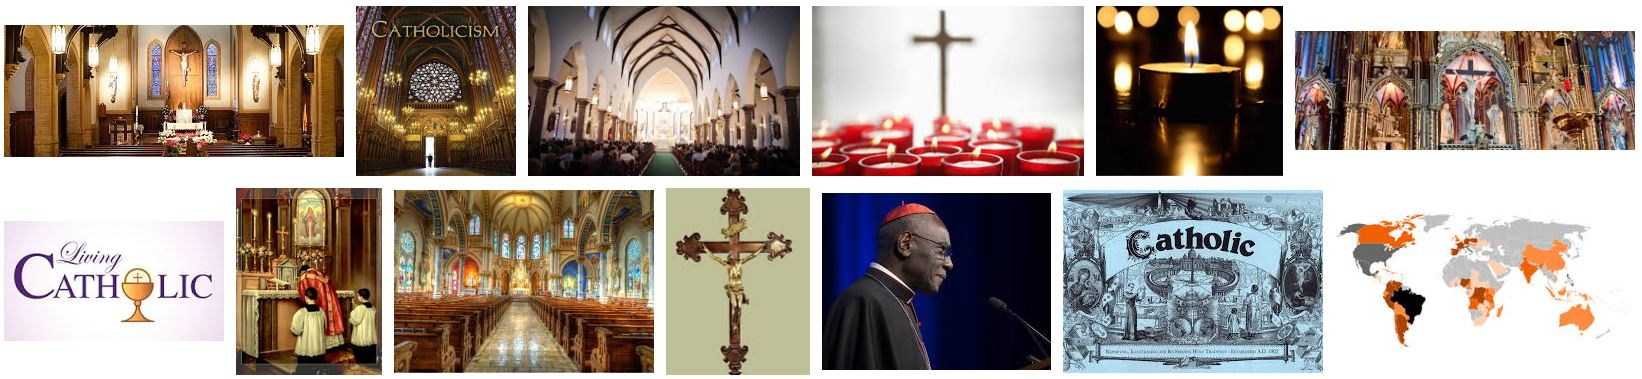 Online Catholics